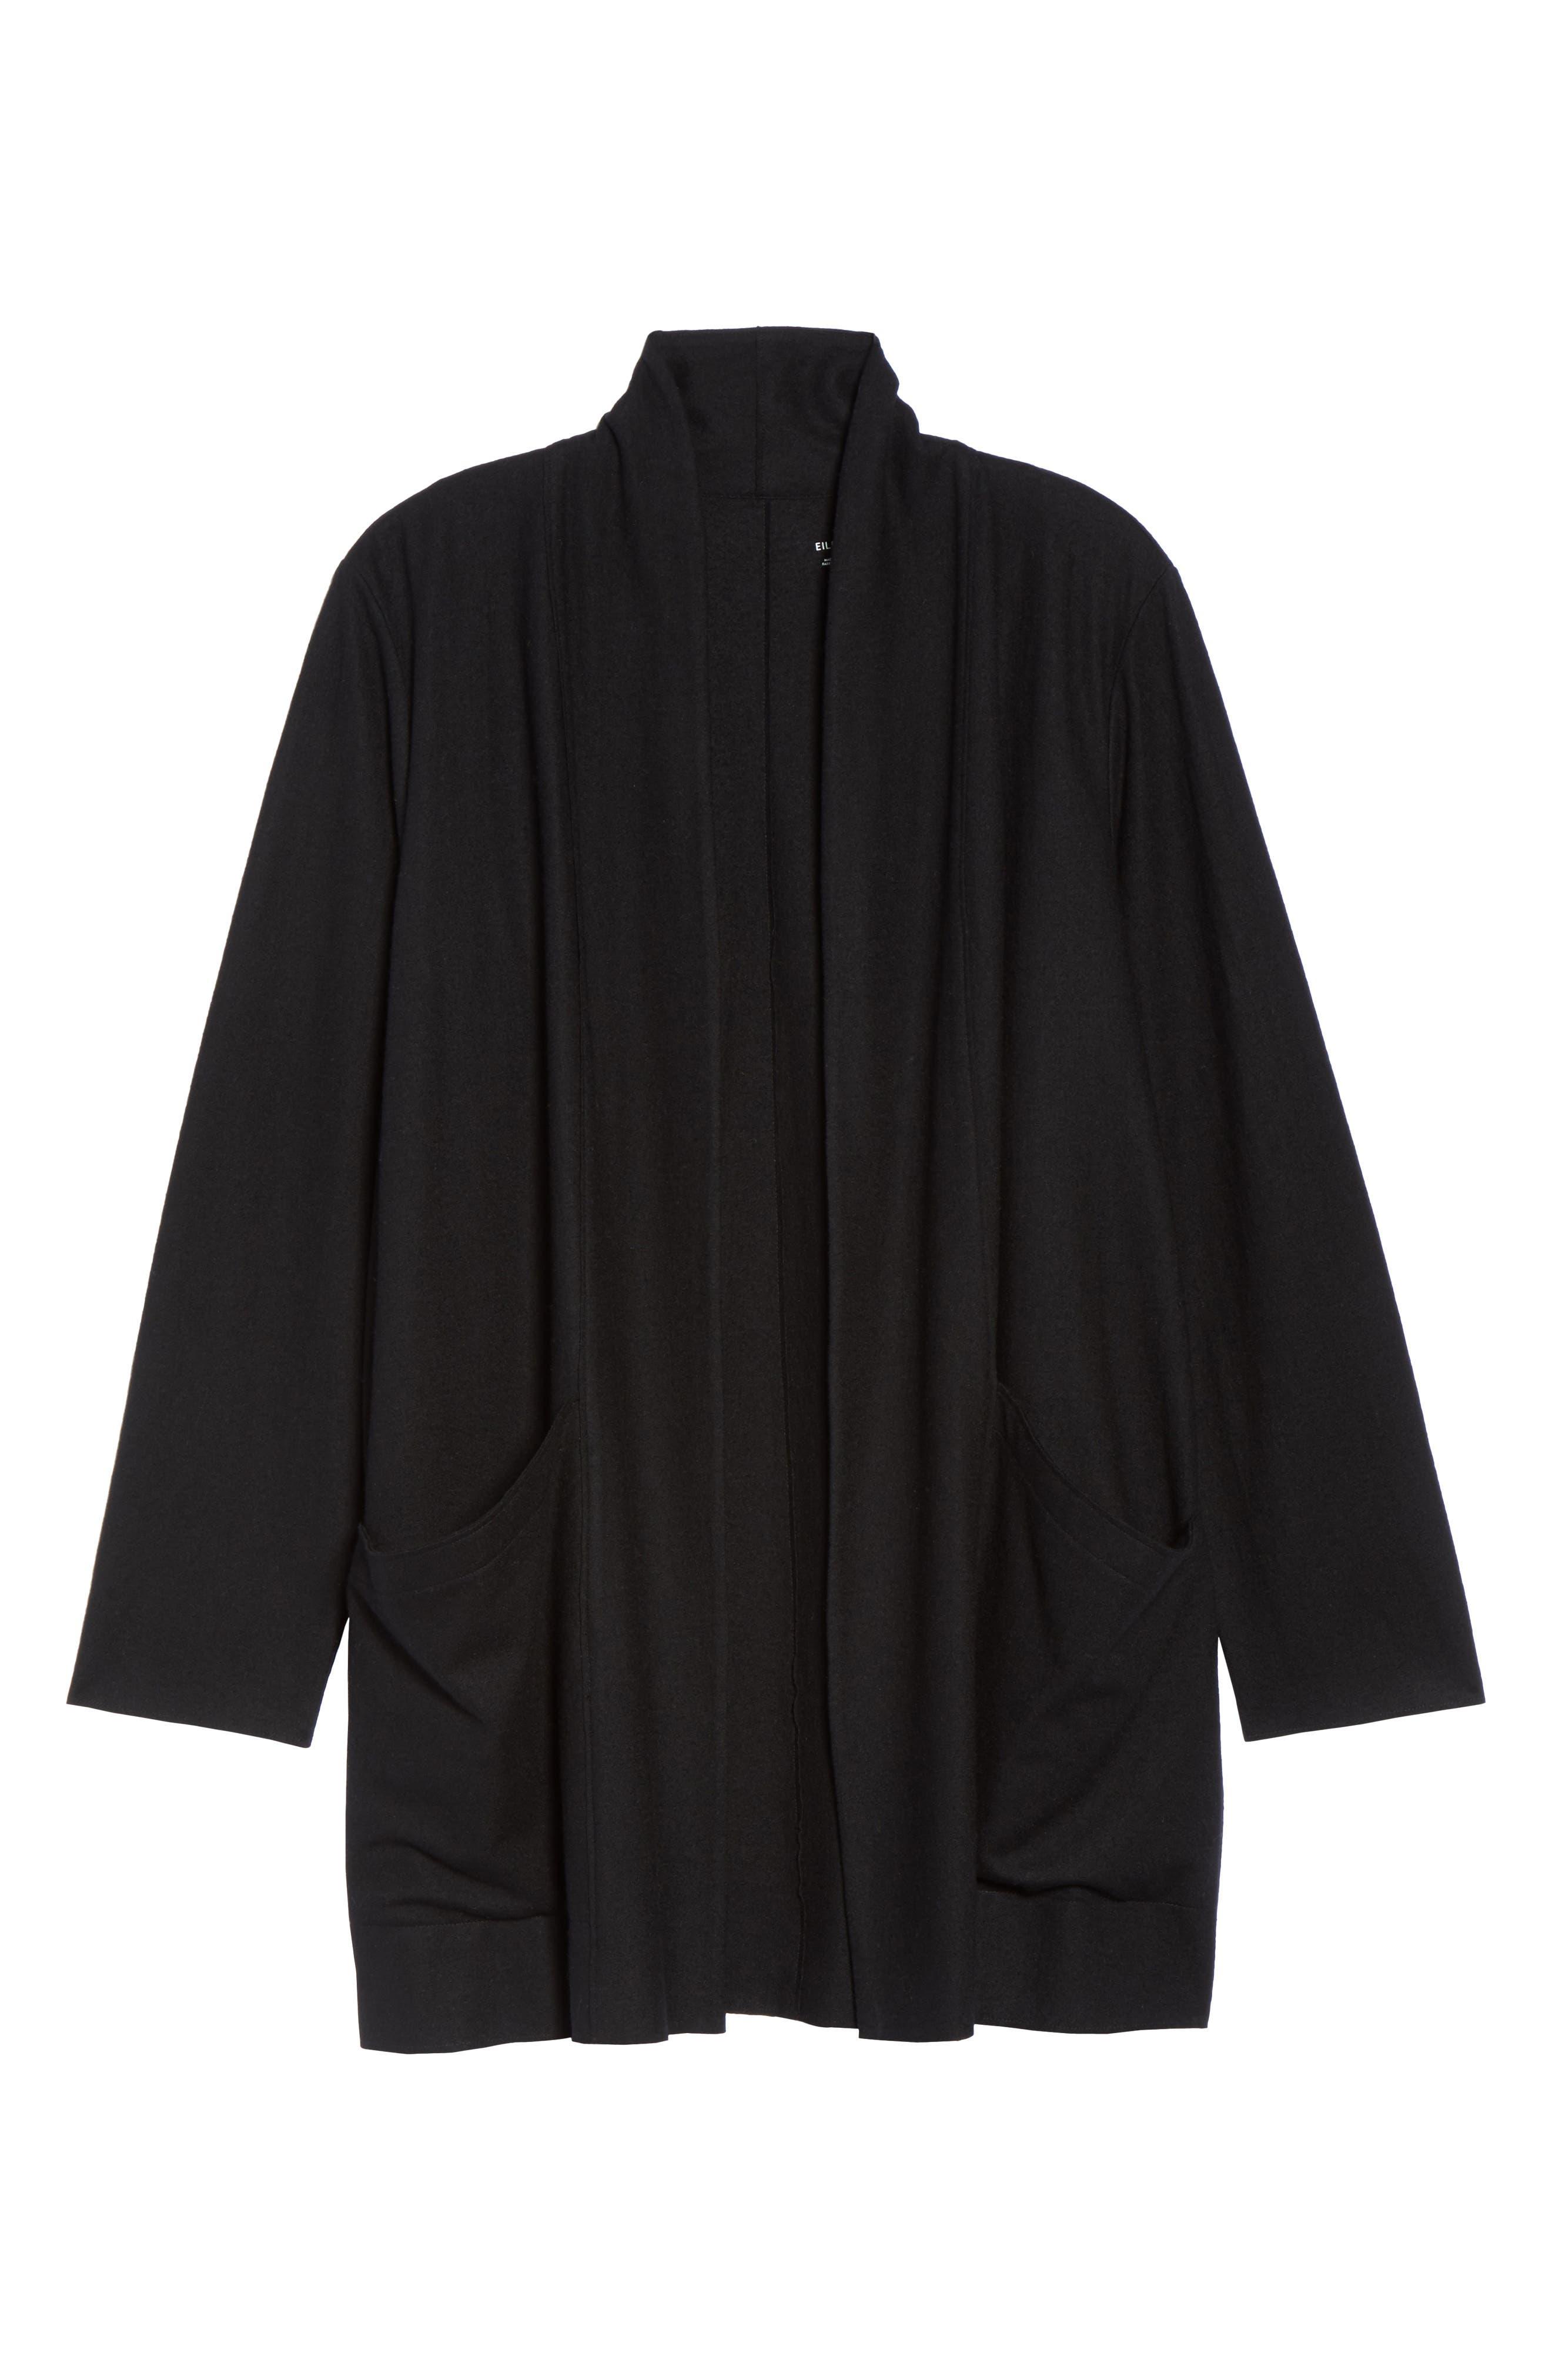 Boiled Wool Jacket,                             Alternate thumbnail 6, color,                             001